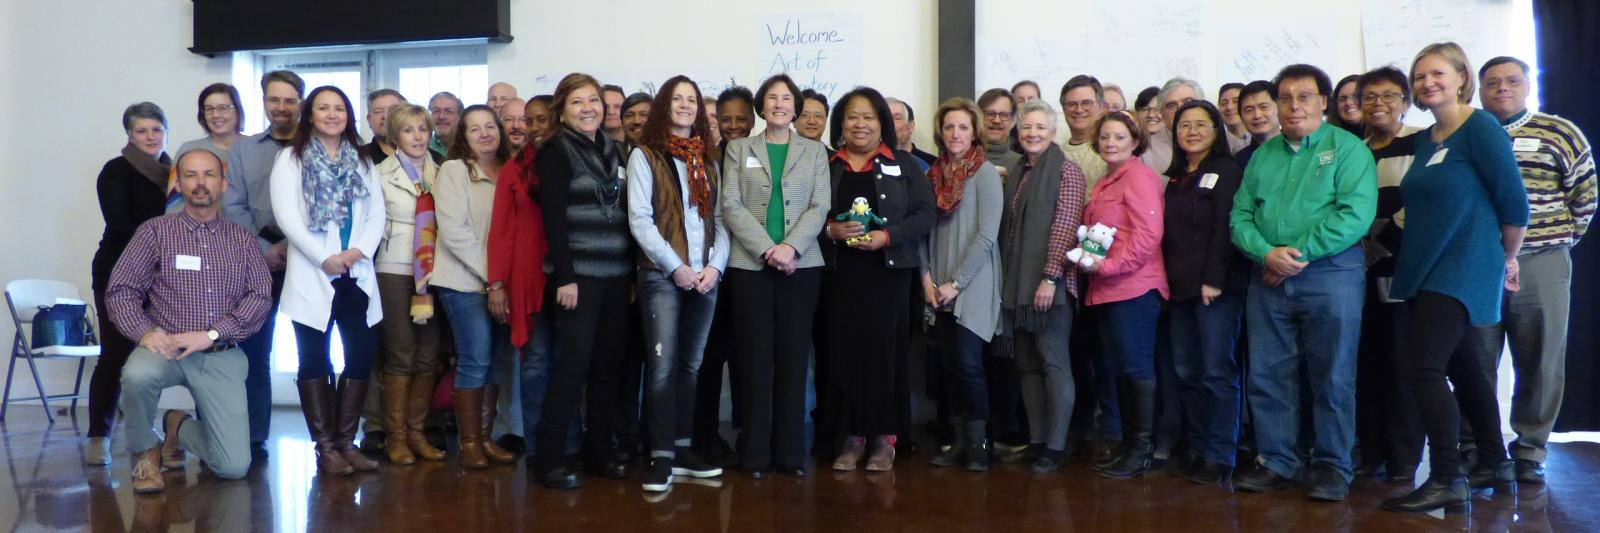 January 2018 Cohort, Art of Participatory Leadership